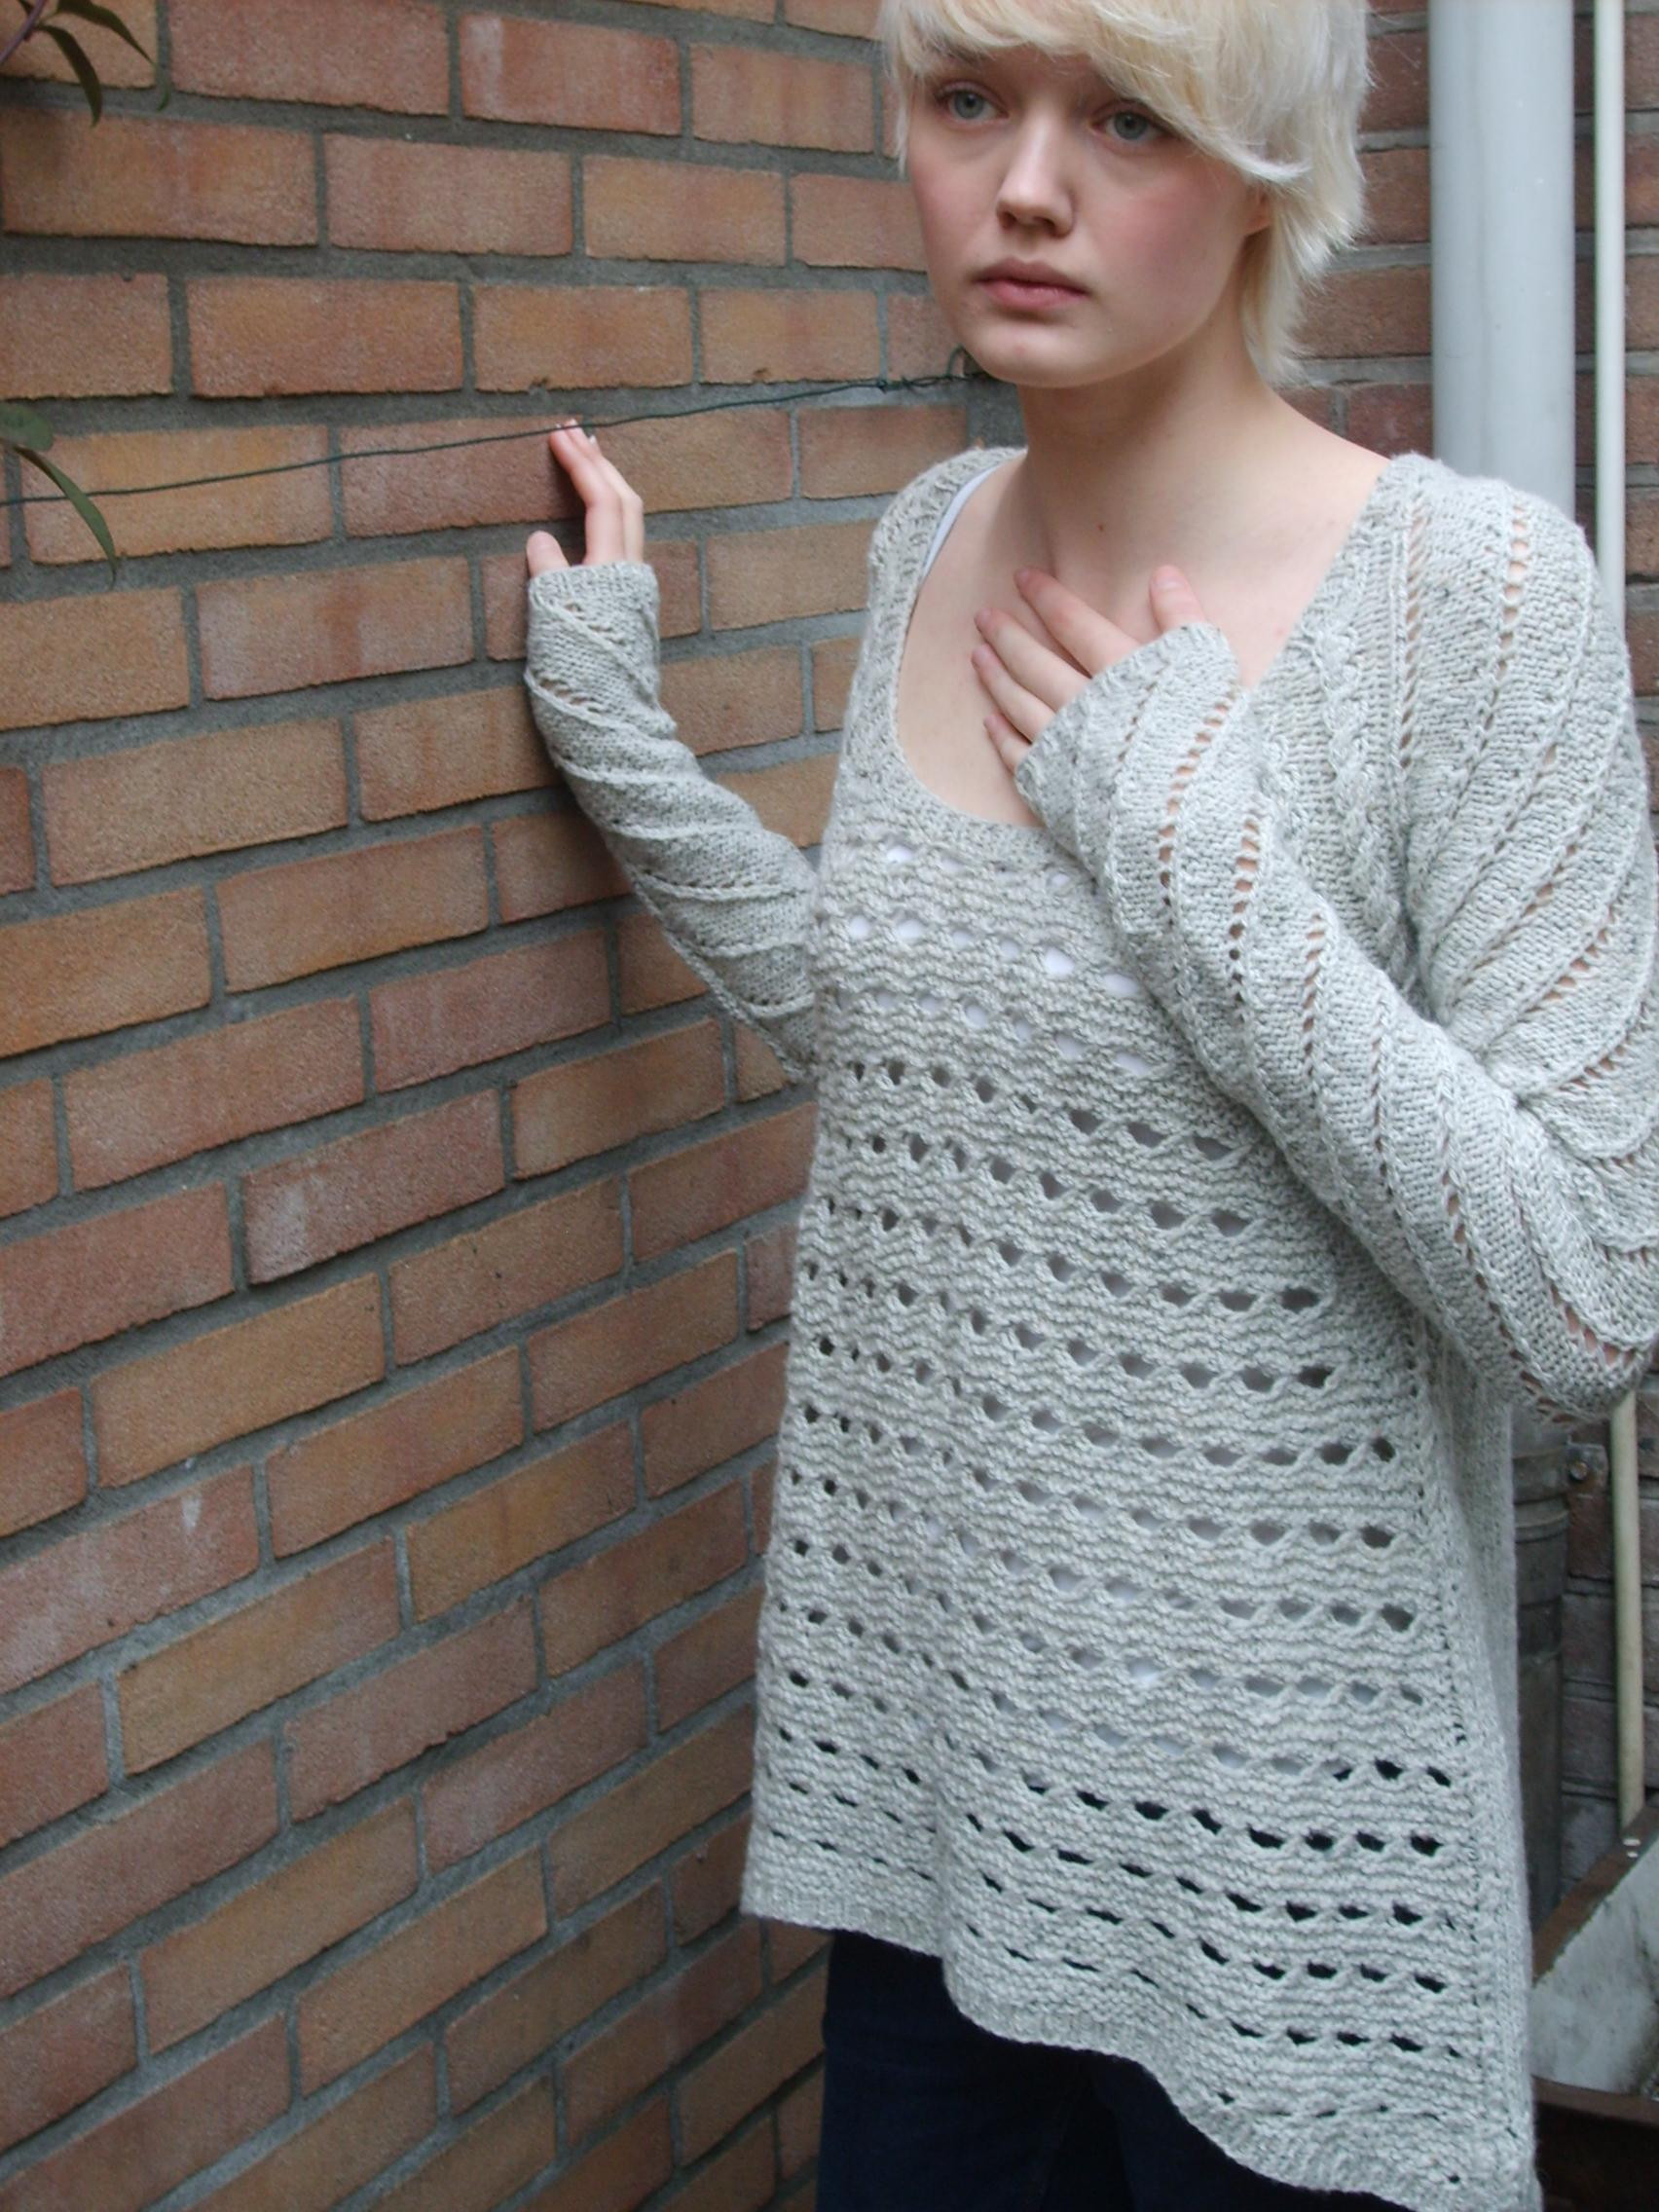 Helmut Inspired Sweater | Artemis Adornments